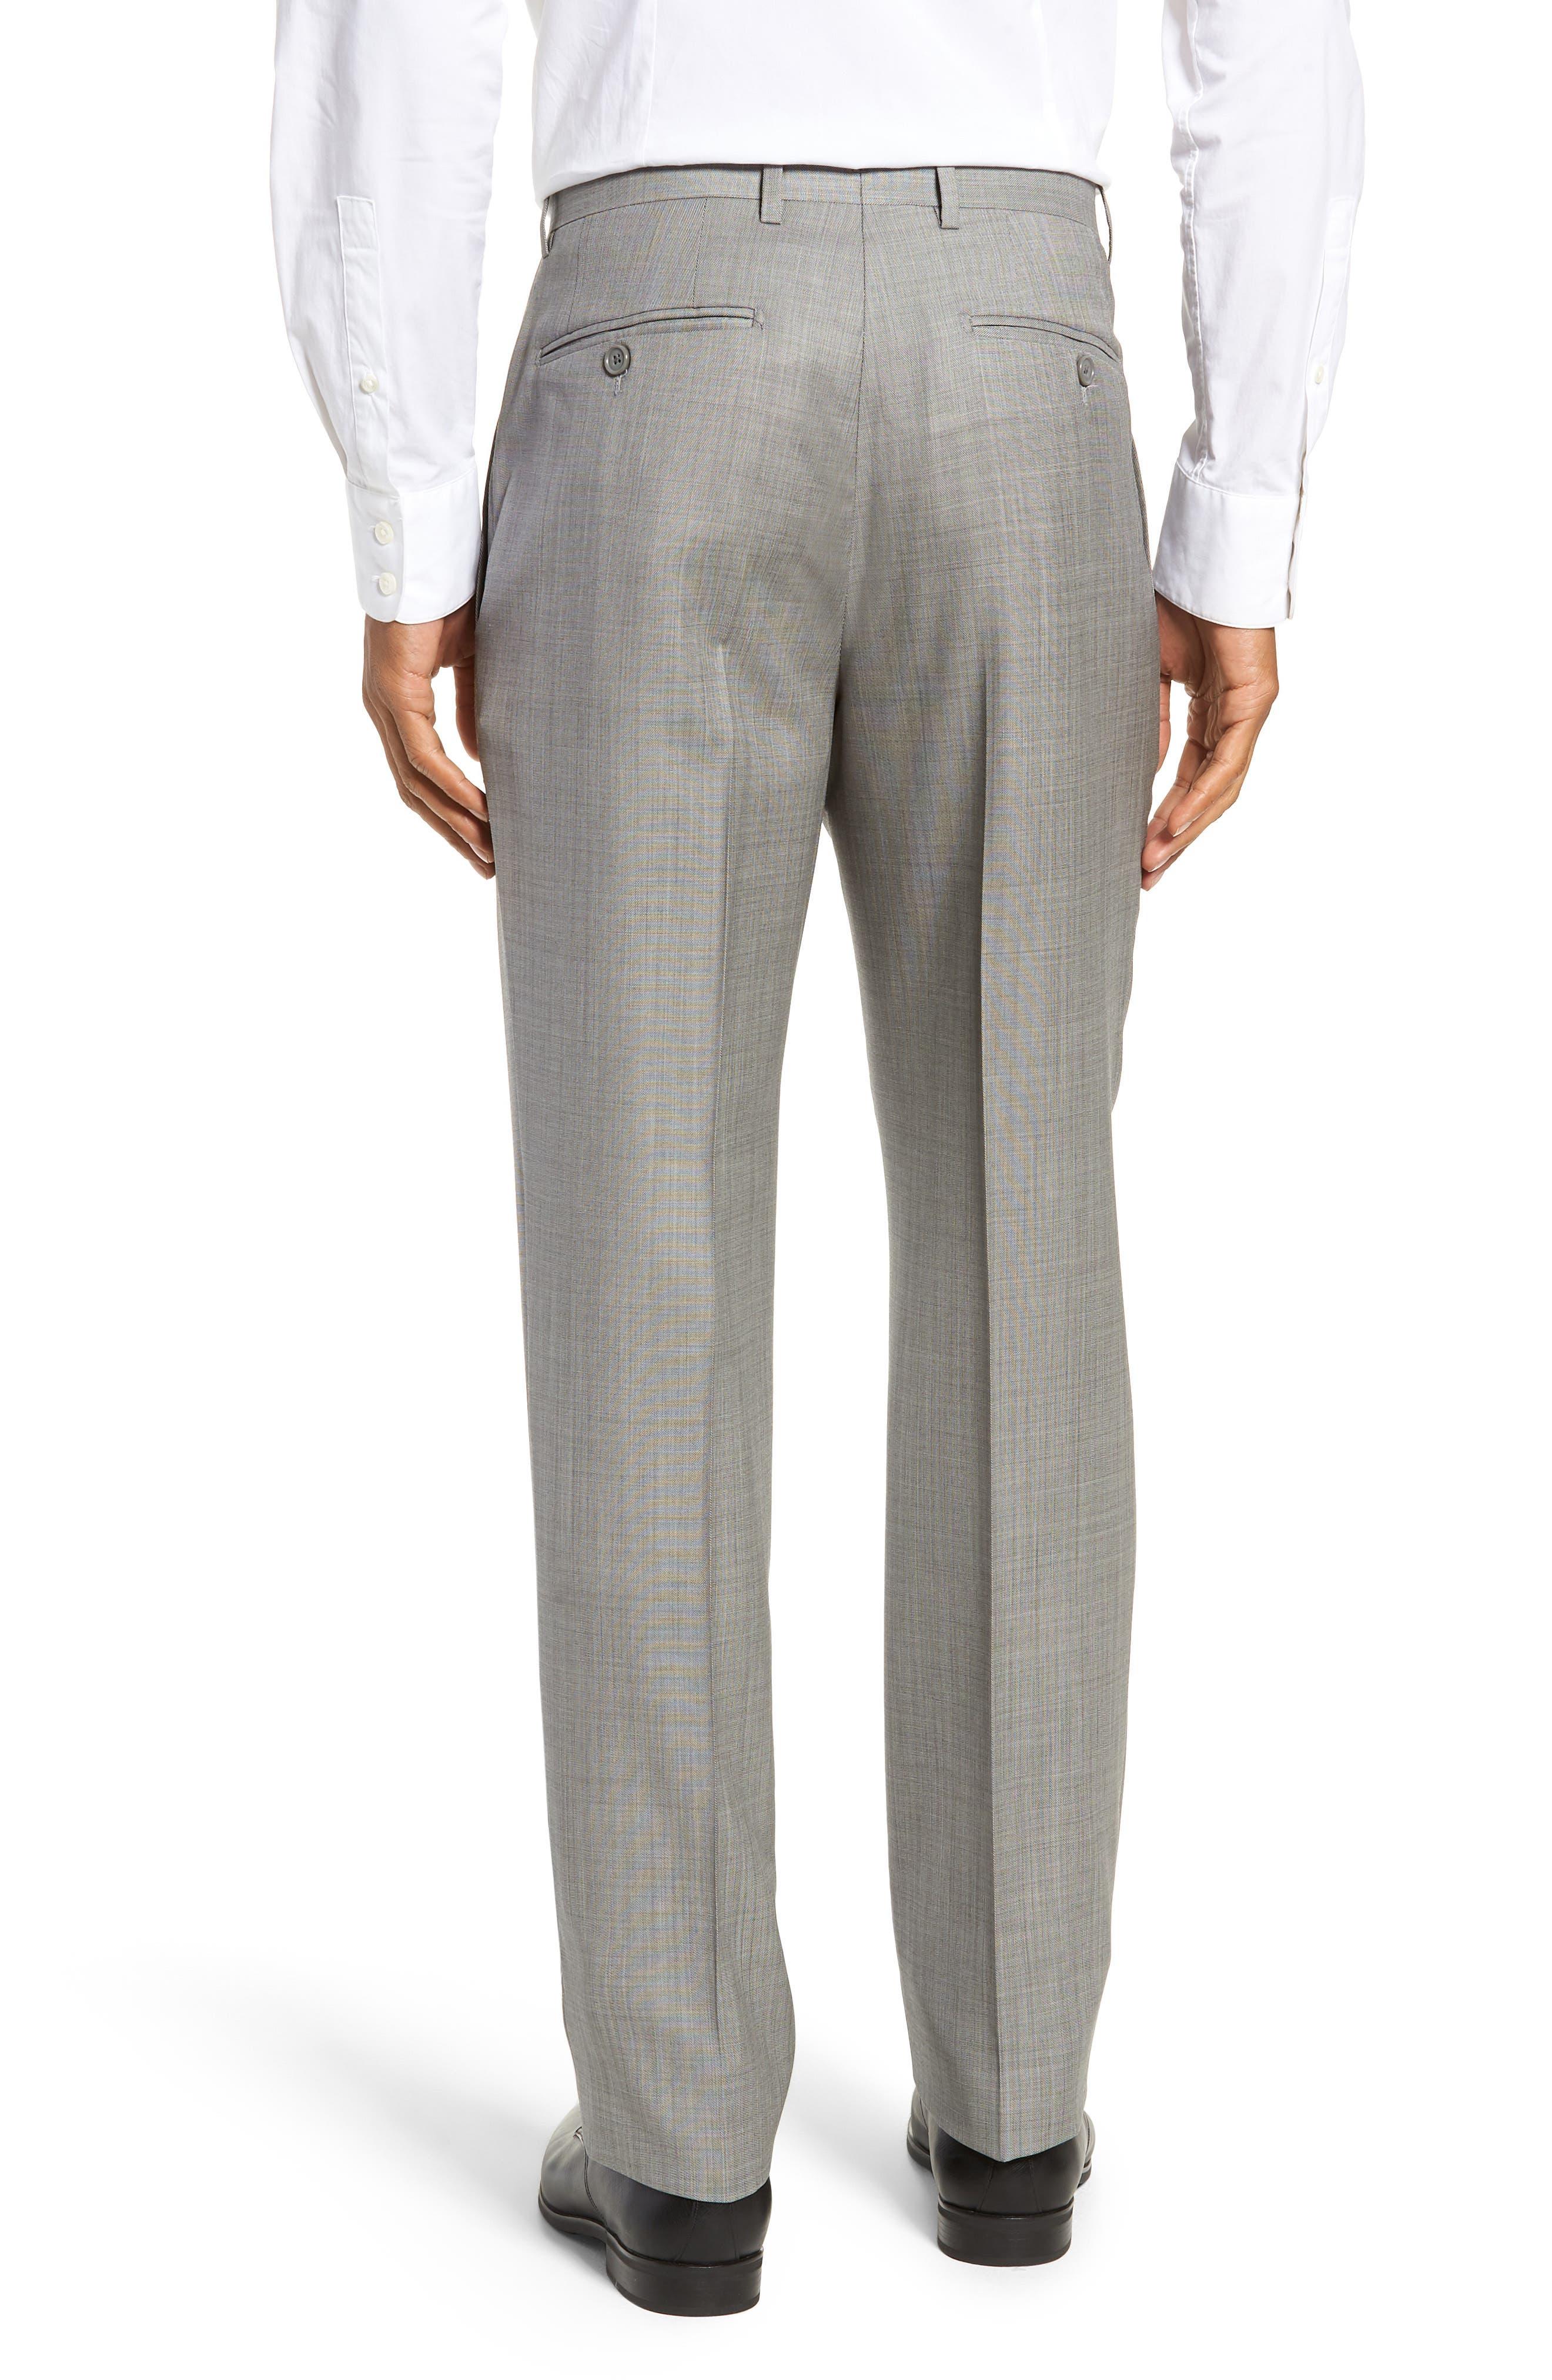 Flat Front Sharkskin Wool Trousers,                             Alternate thumbnail 2, color,                             LIGHT GREY